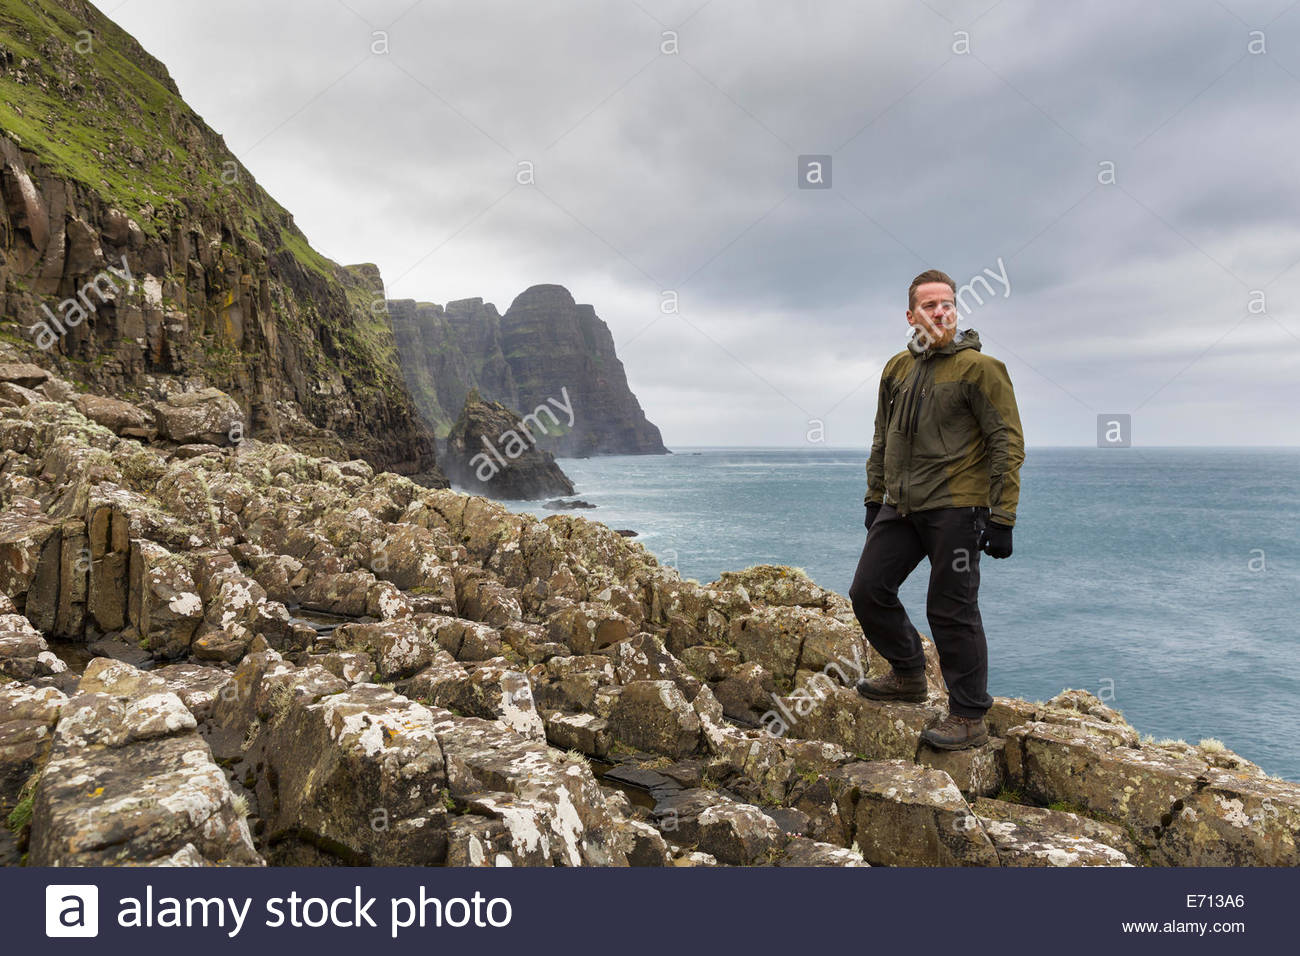 Lobranseidi, Isole Faerøer, Danimarca Immagini Stock